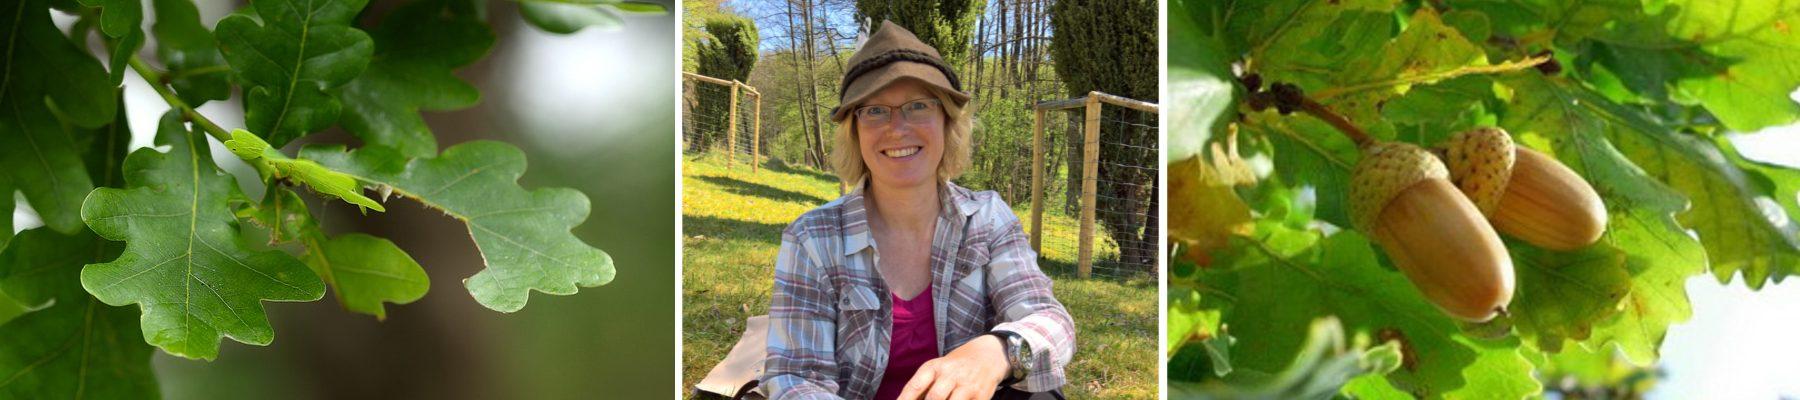 Eva Nußbaumer Naturpädagogin/ Museumspädagogin